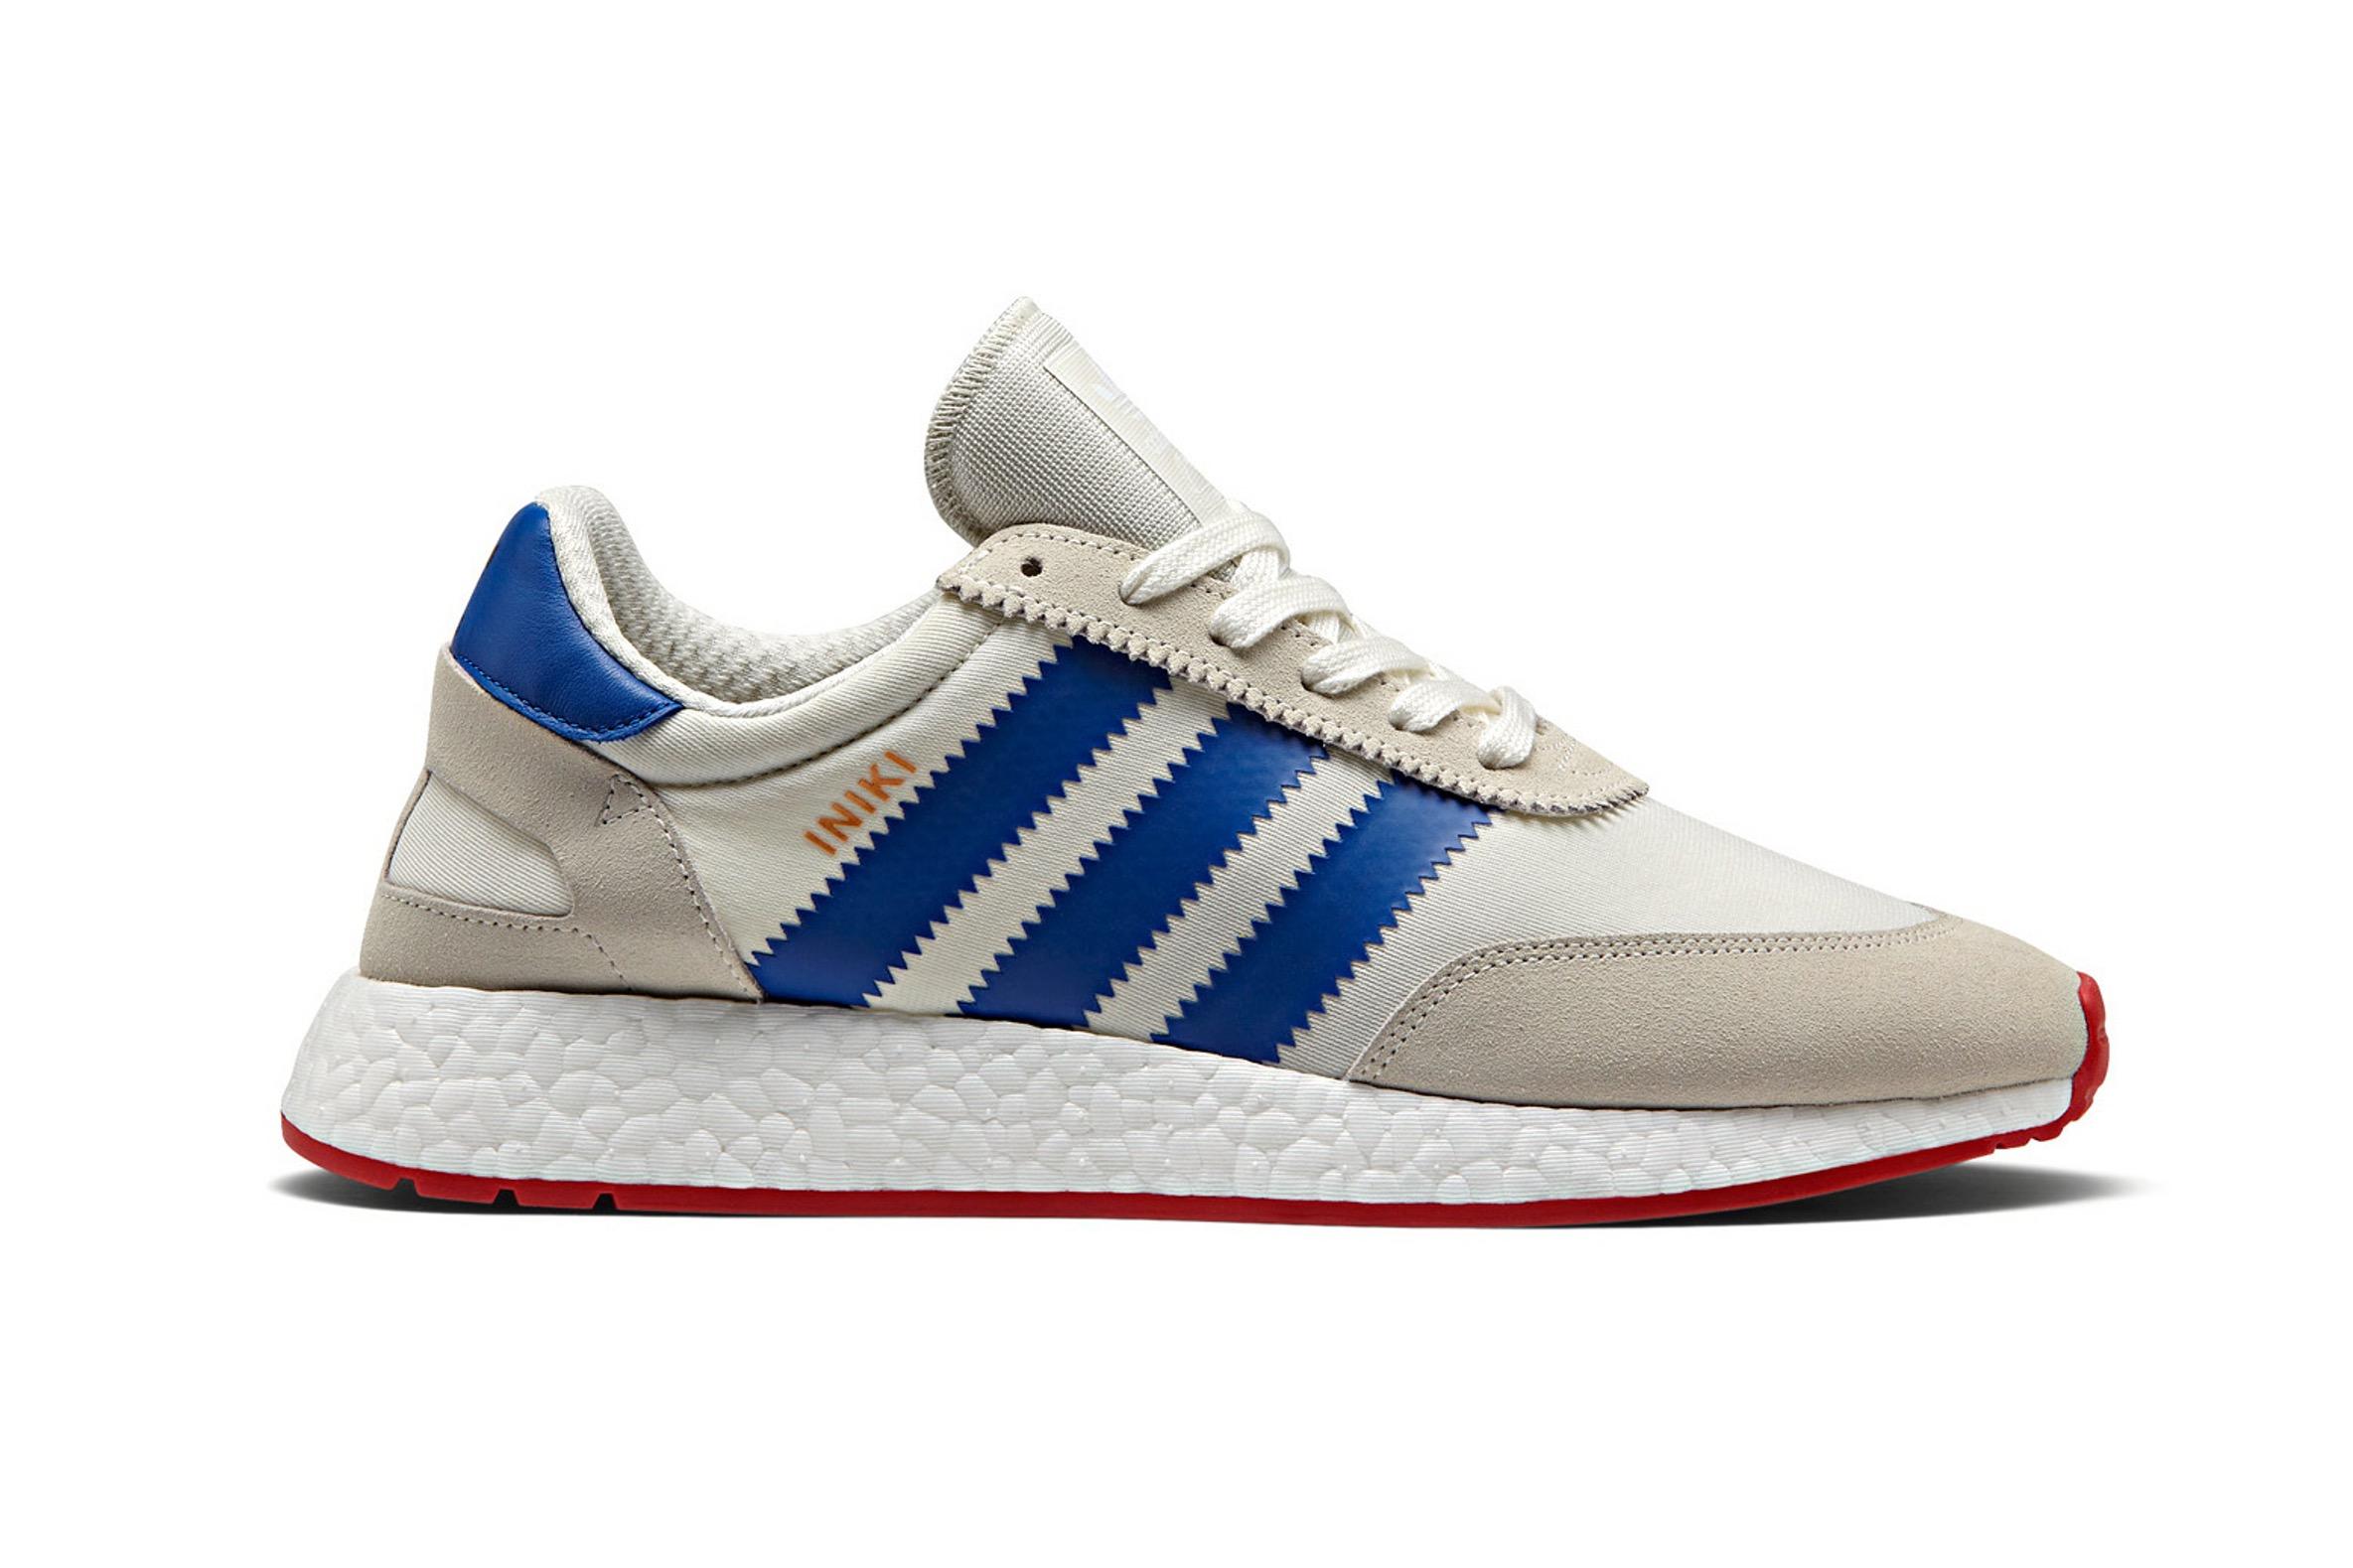 http---hypebeast.com-image-2017-04-adidas-originals-iniki-runner-pride-of-the-70s-1